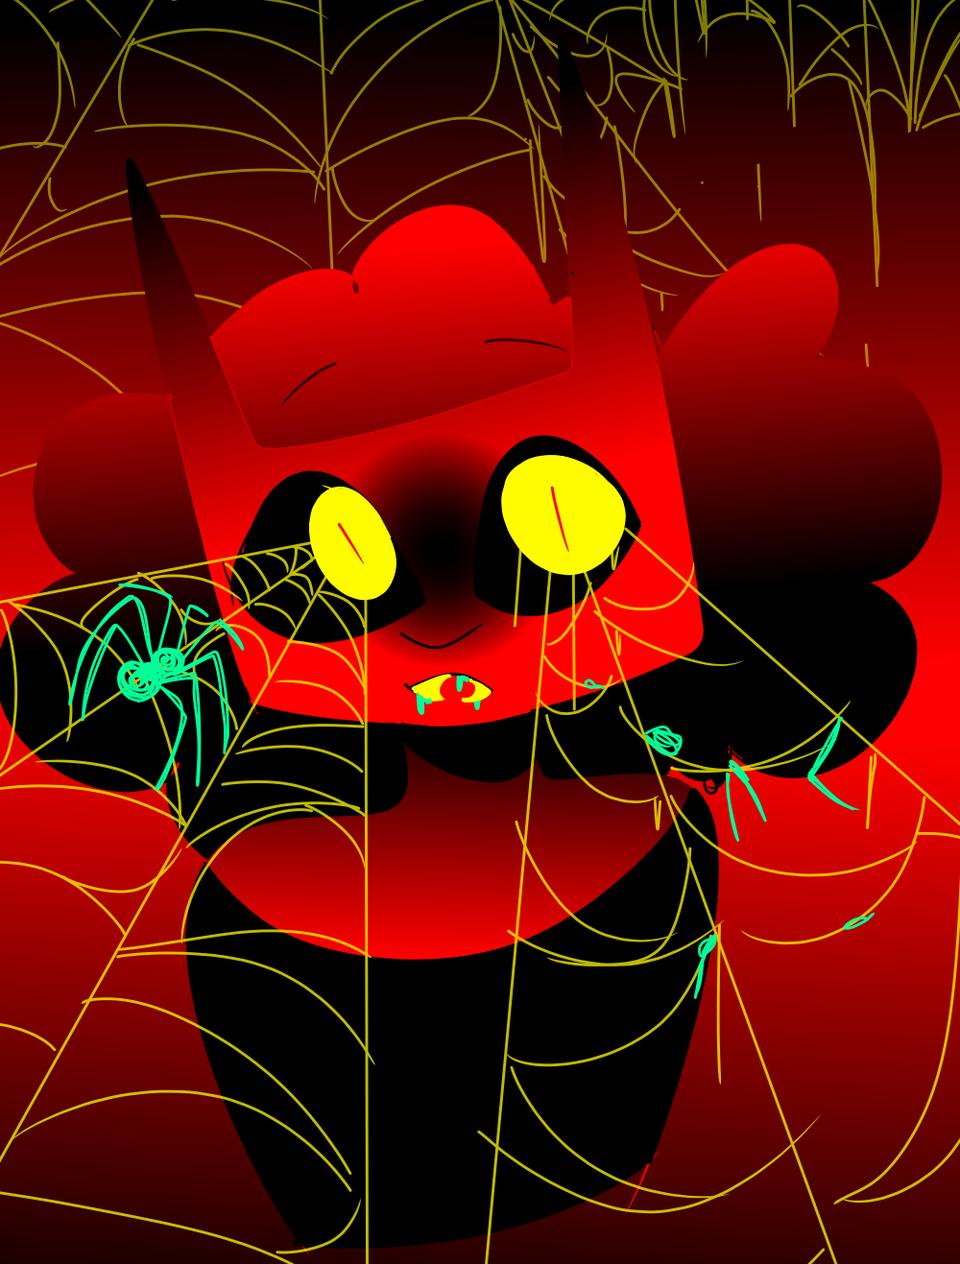 Mmm webbins